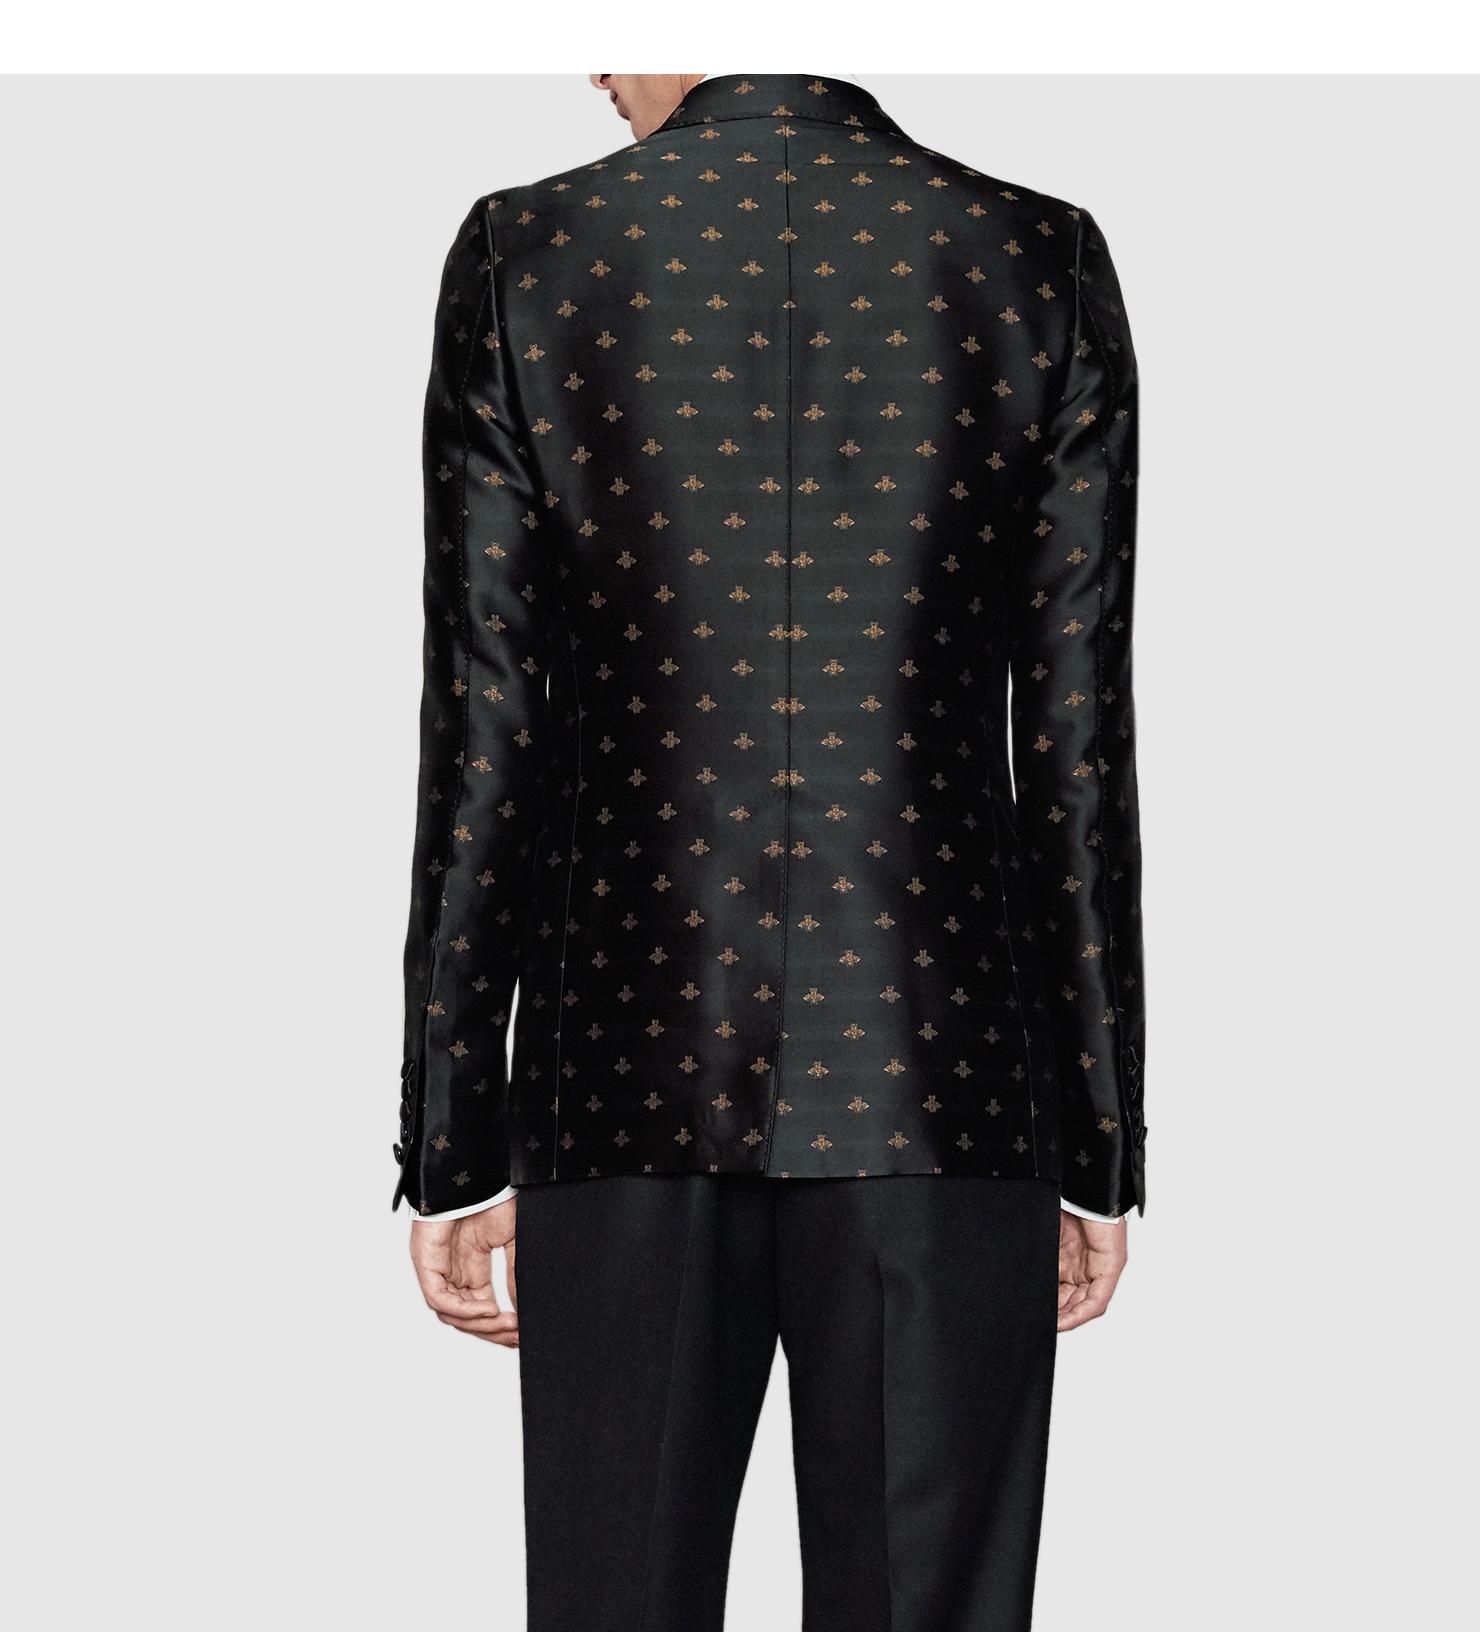 lyst gucci bee jacquard monaco jacket in black for men